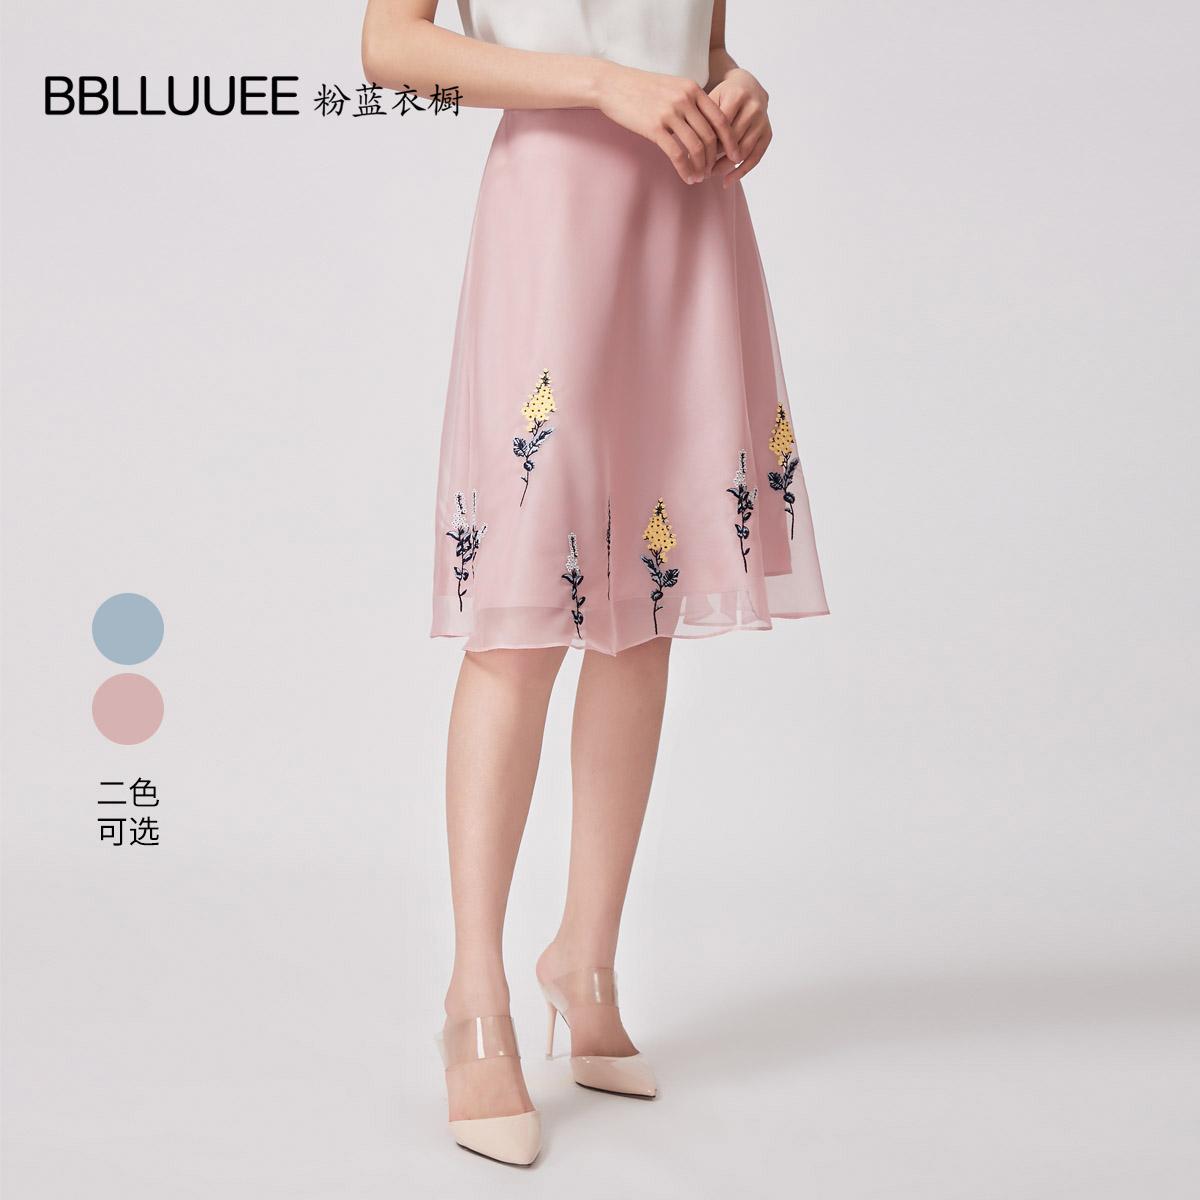 BBLLUUEE/粉蓝衣橱2020夏季新款简约伞状A摆高腰显瘦绣花半裙女【图2】